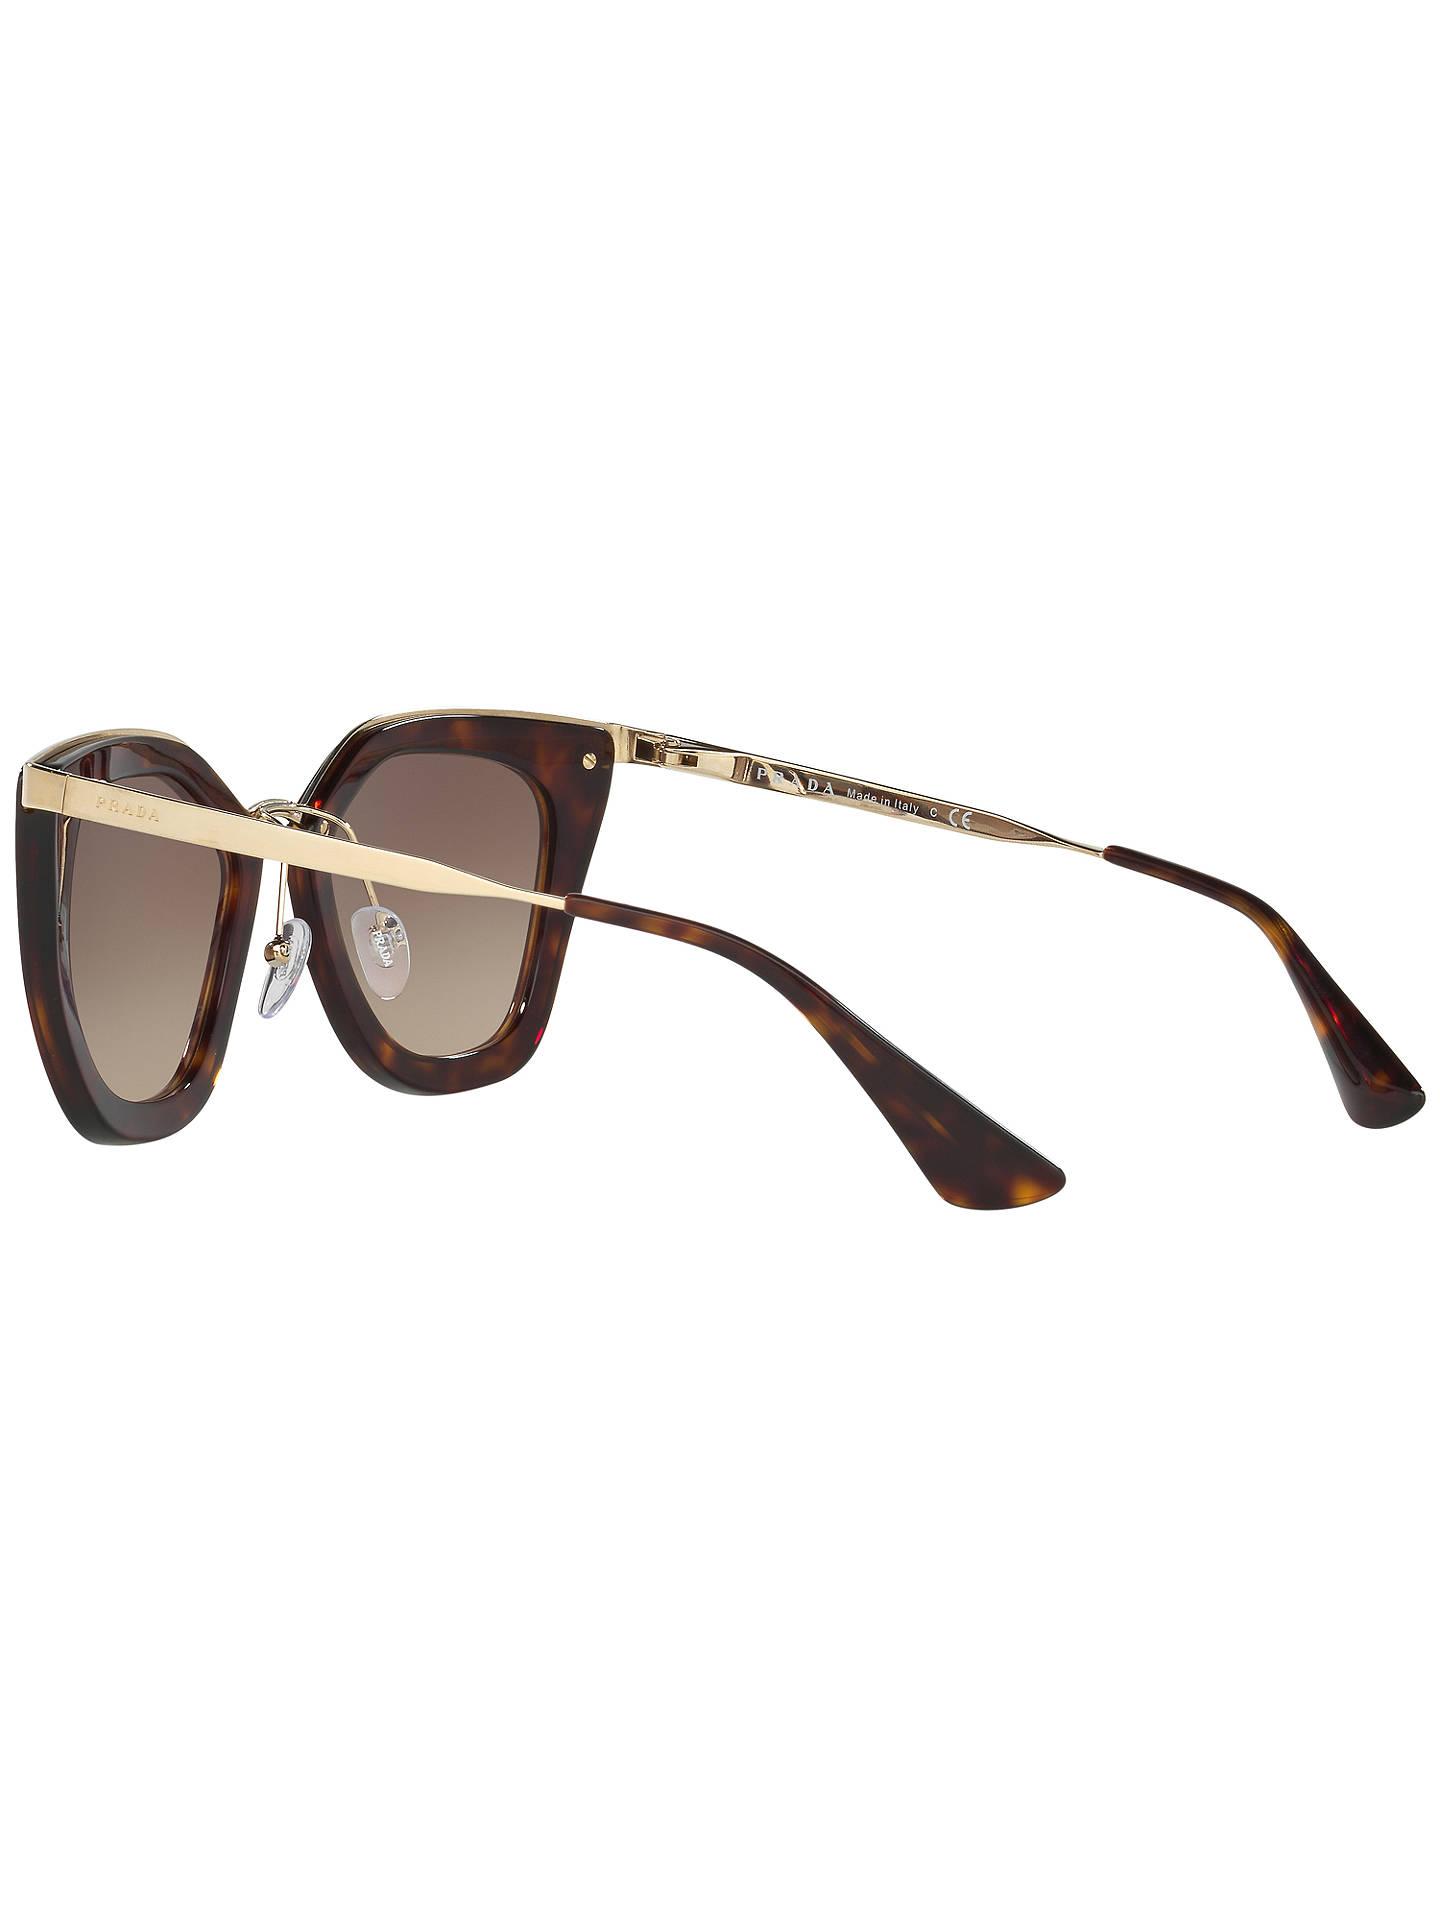 68d180a92d Prada PR 53SS Gradient Cat s Eye Sunglasses at John Lewis   Partners